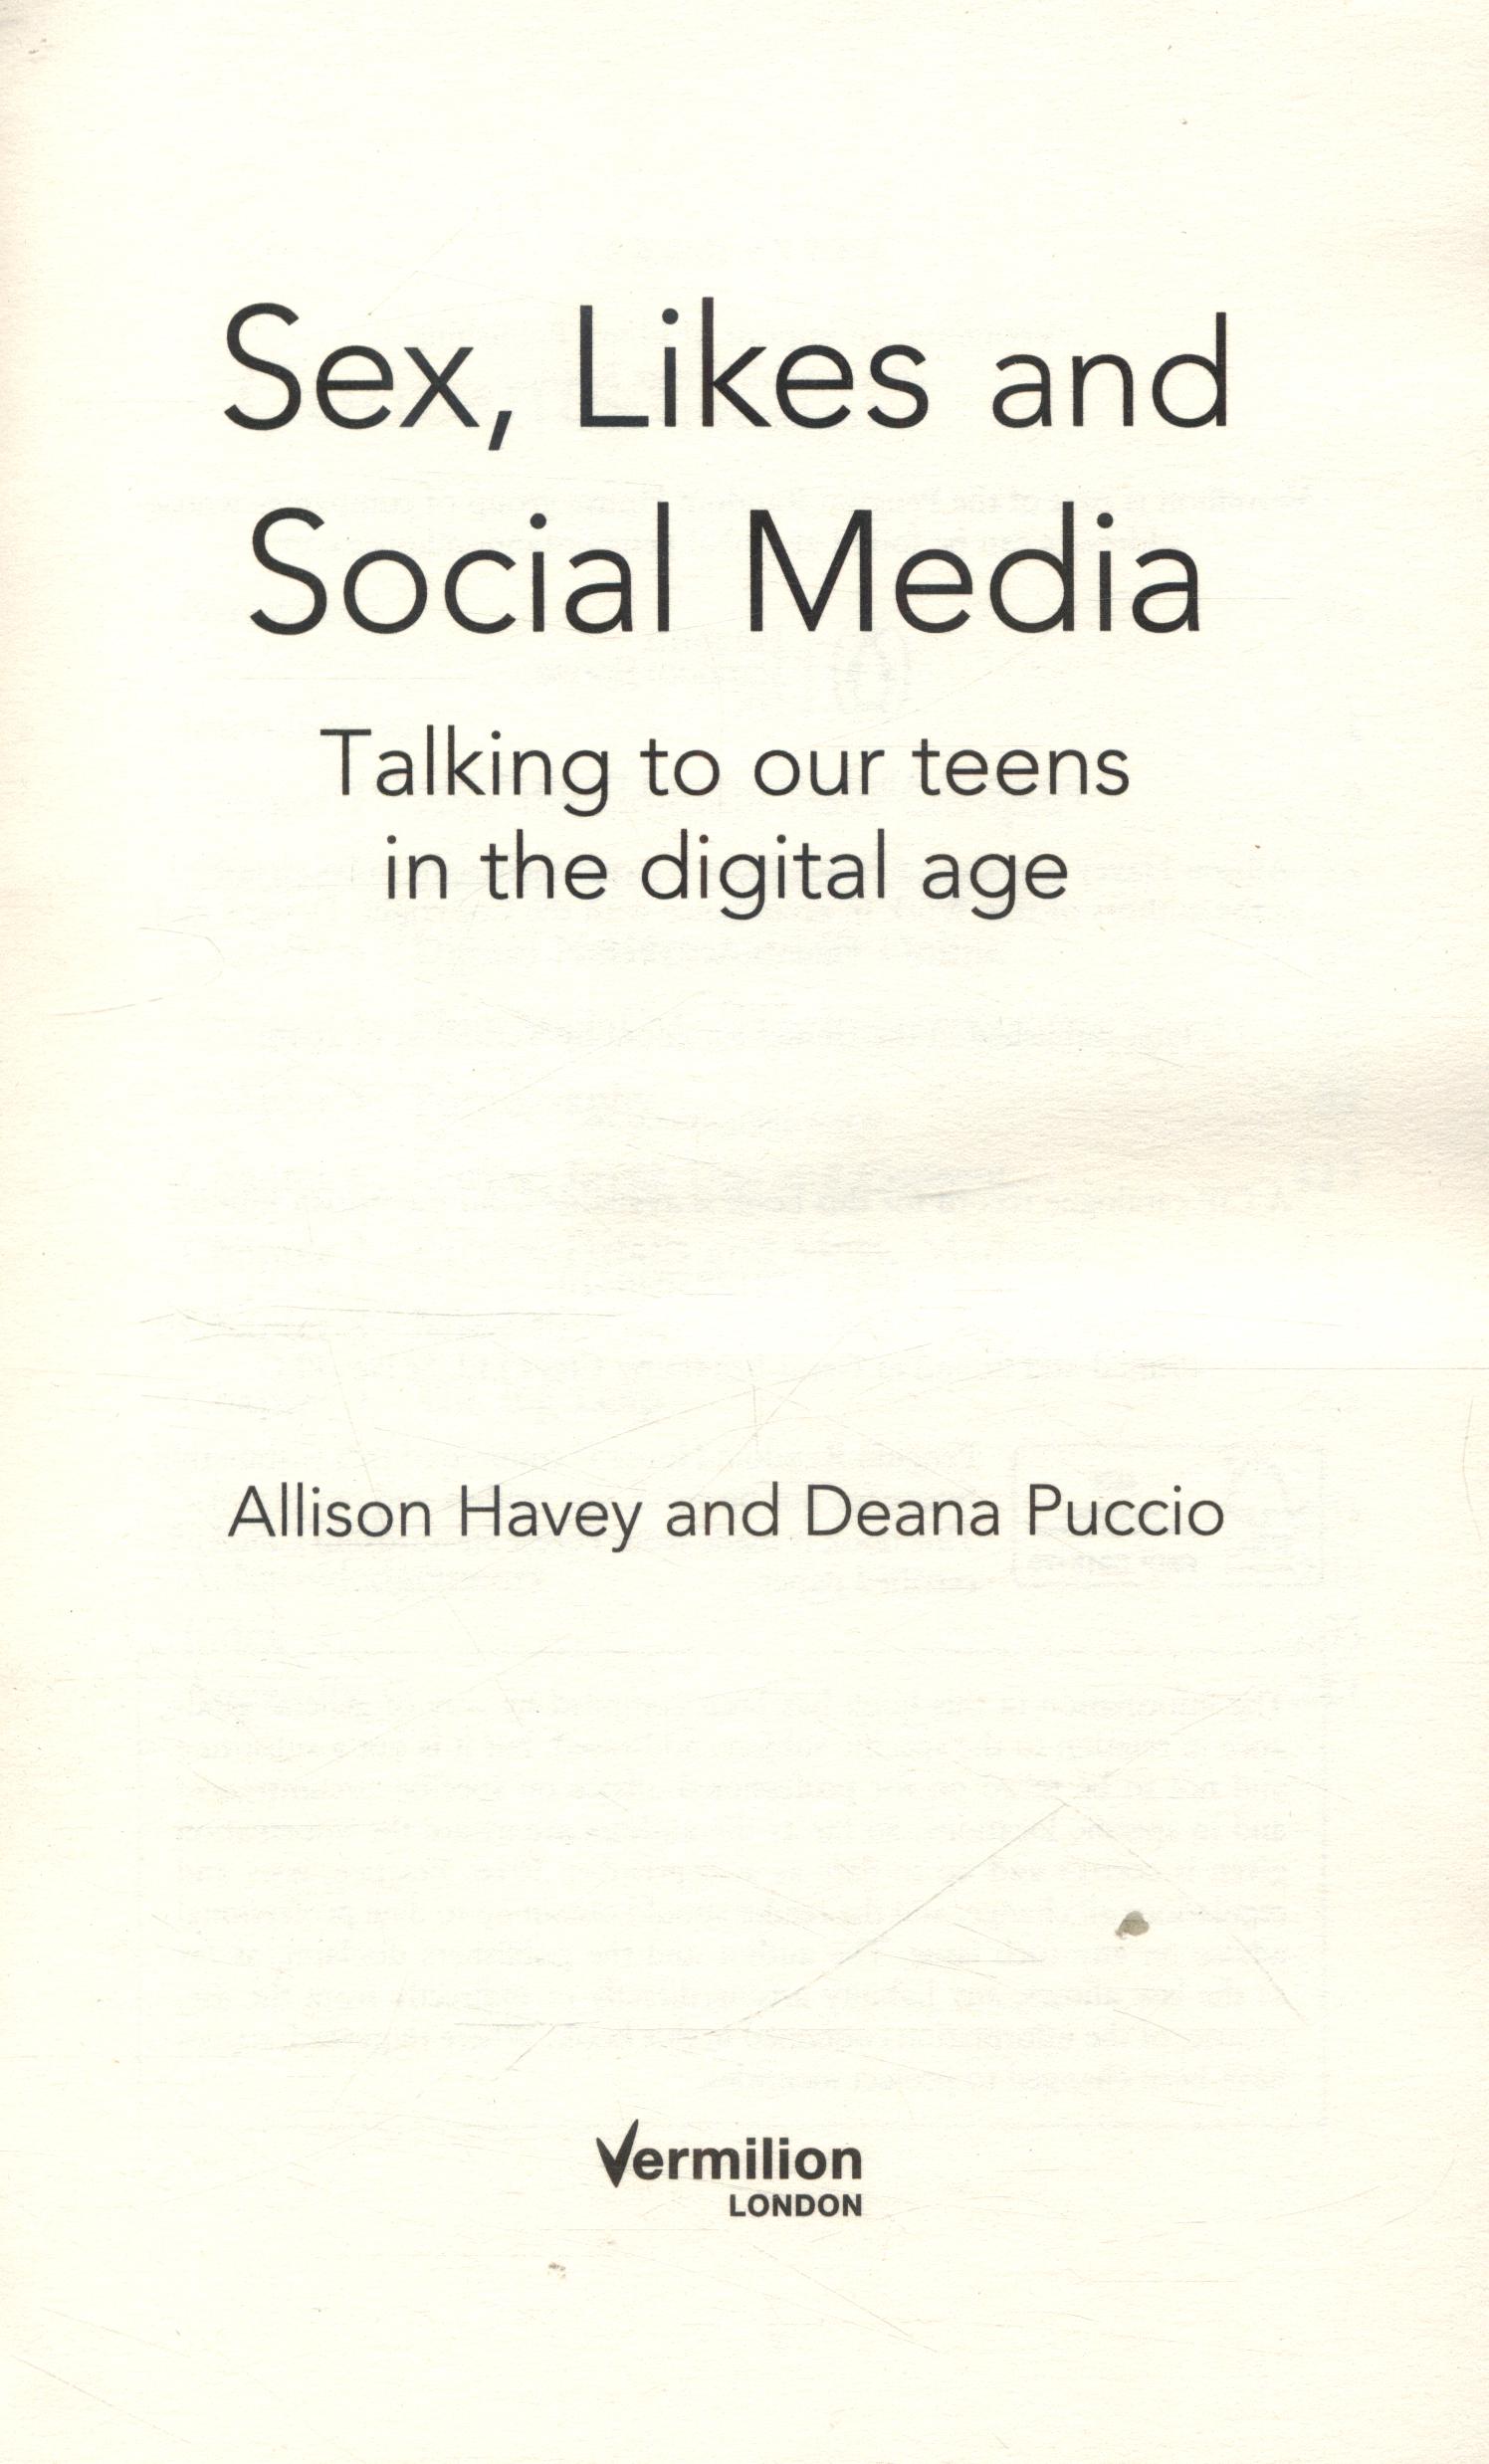 Exploring the Relationship Between Media and Adolescent